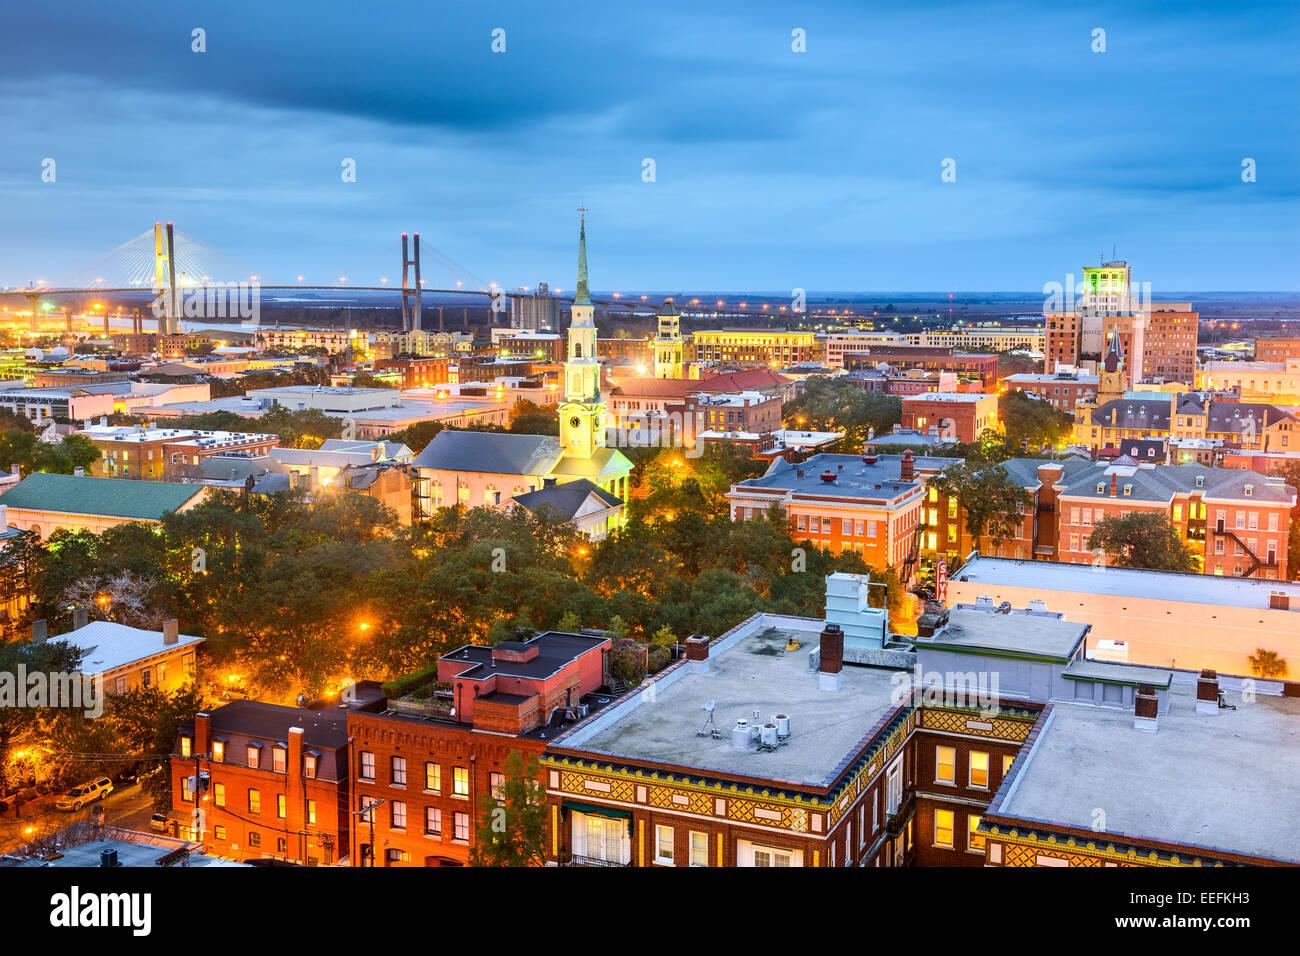 Savannah, Georgia, USA Centre-ville la nuit. Photo Stock